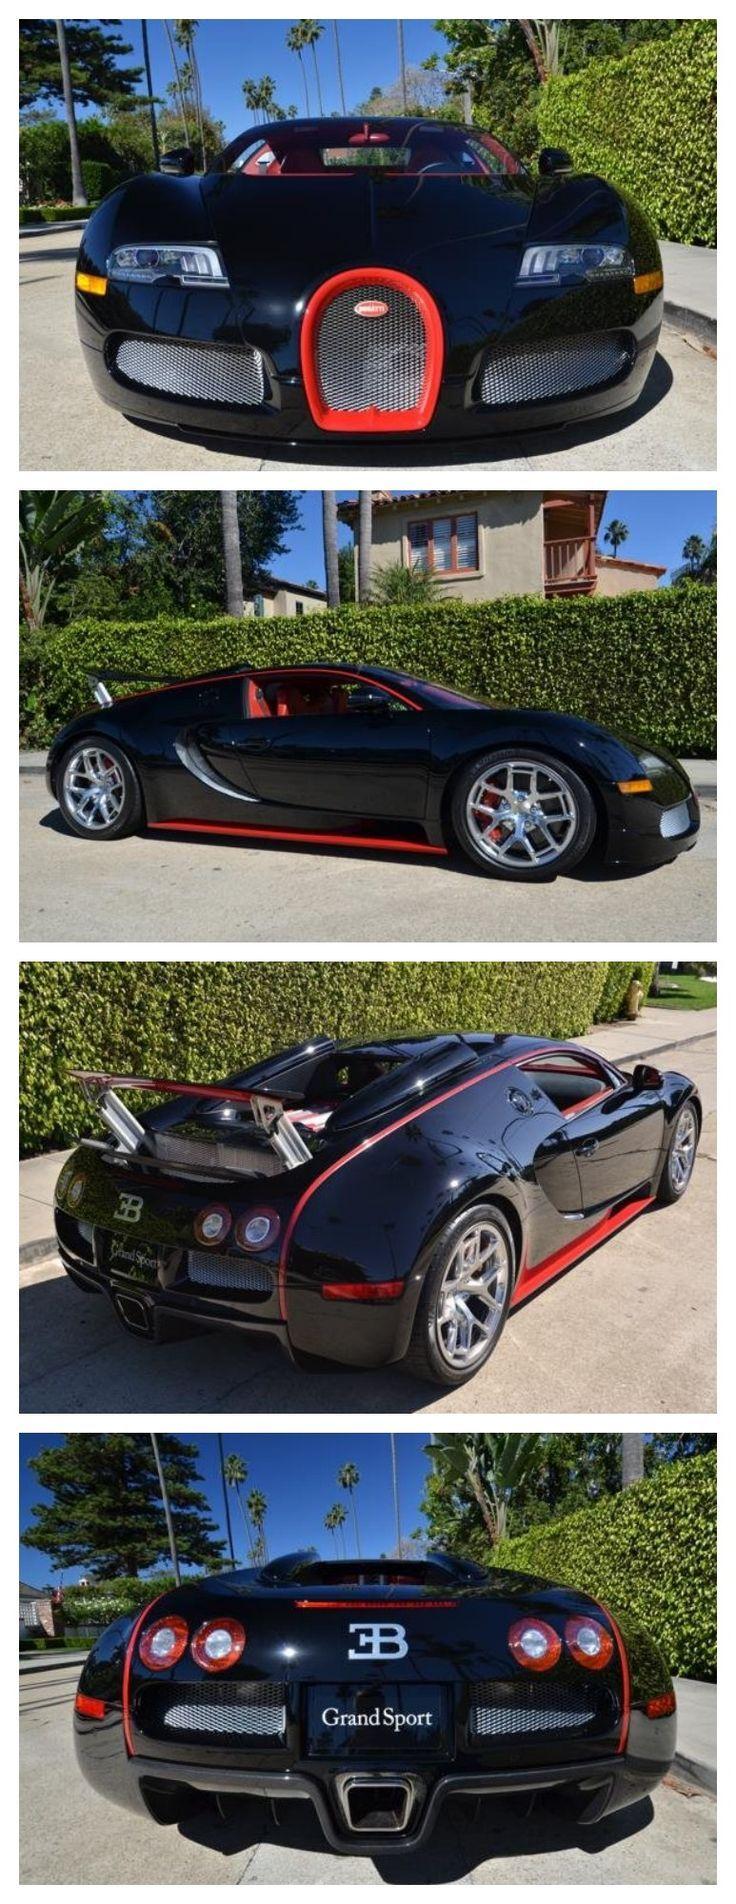 17 best images about dream cars on pinterest corvettes porsche carrera and. Black Bedroom Furniture Sets. Home Design Ideas